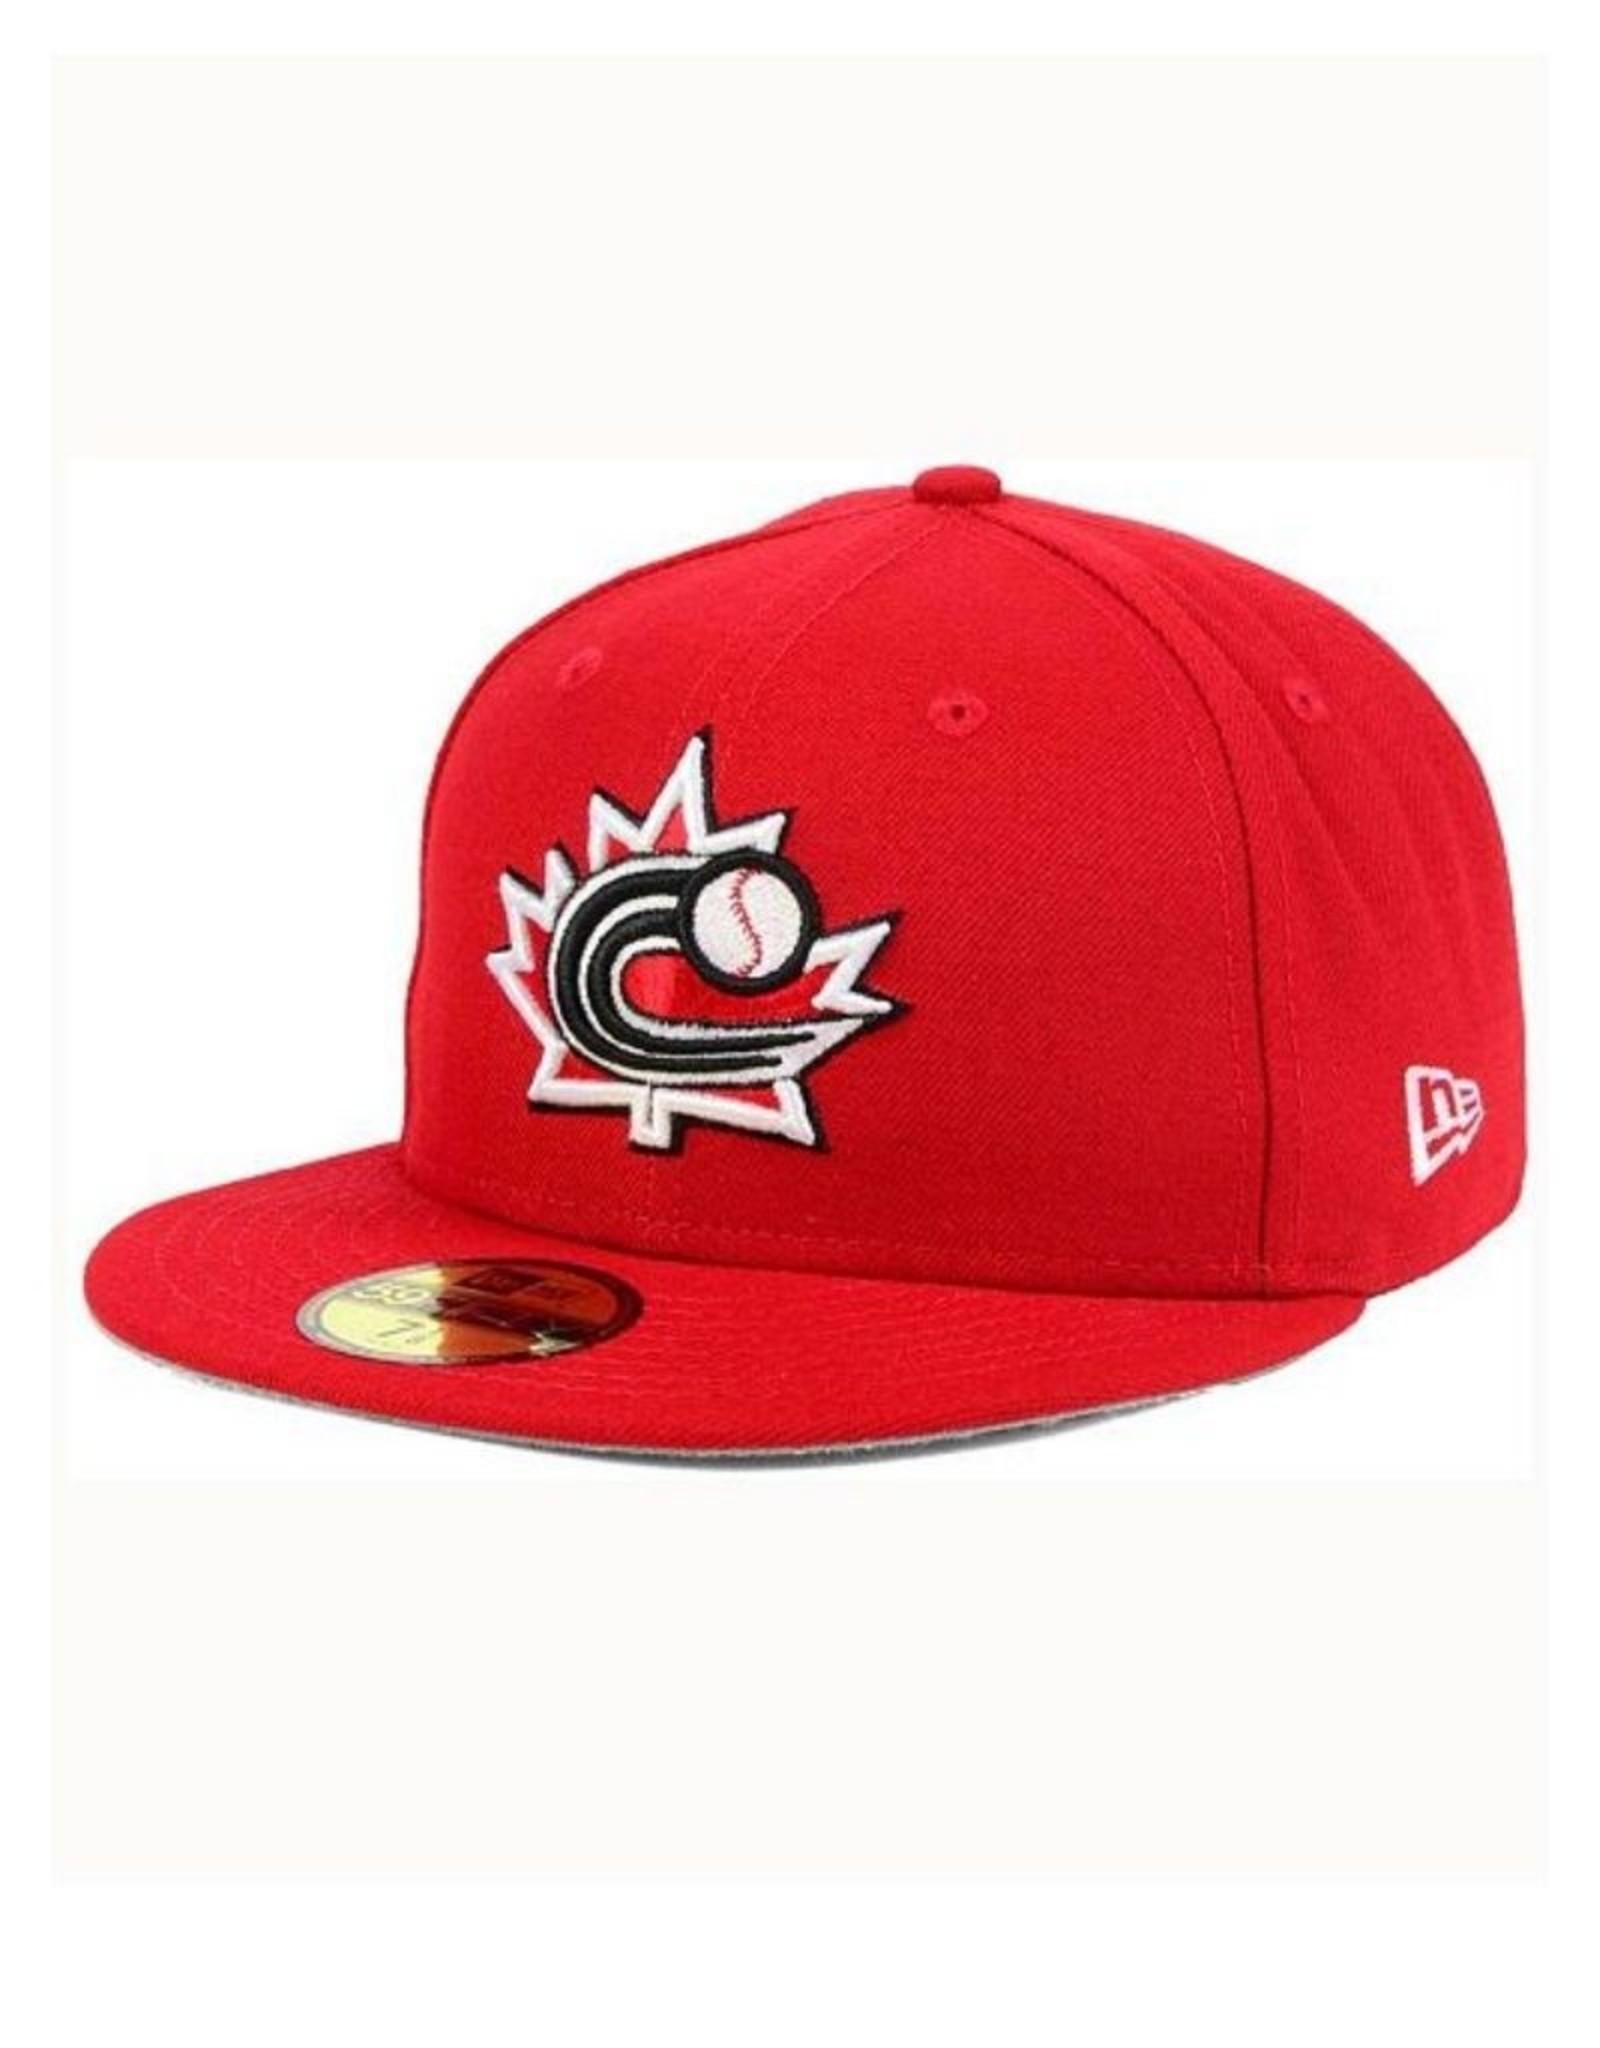 New Era On-Field Hat Canada Baseball Red